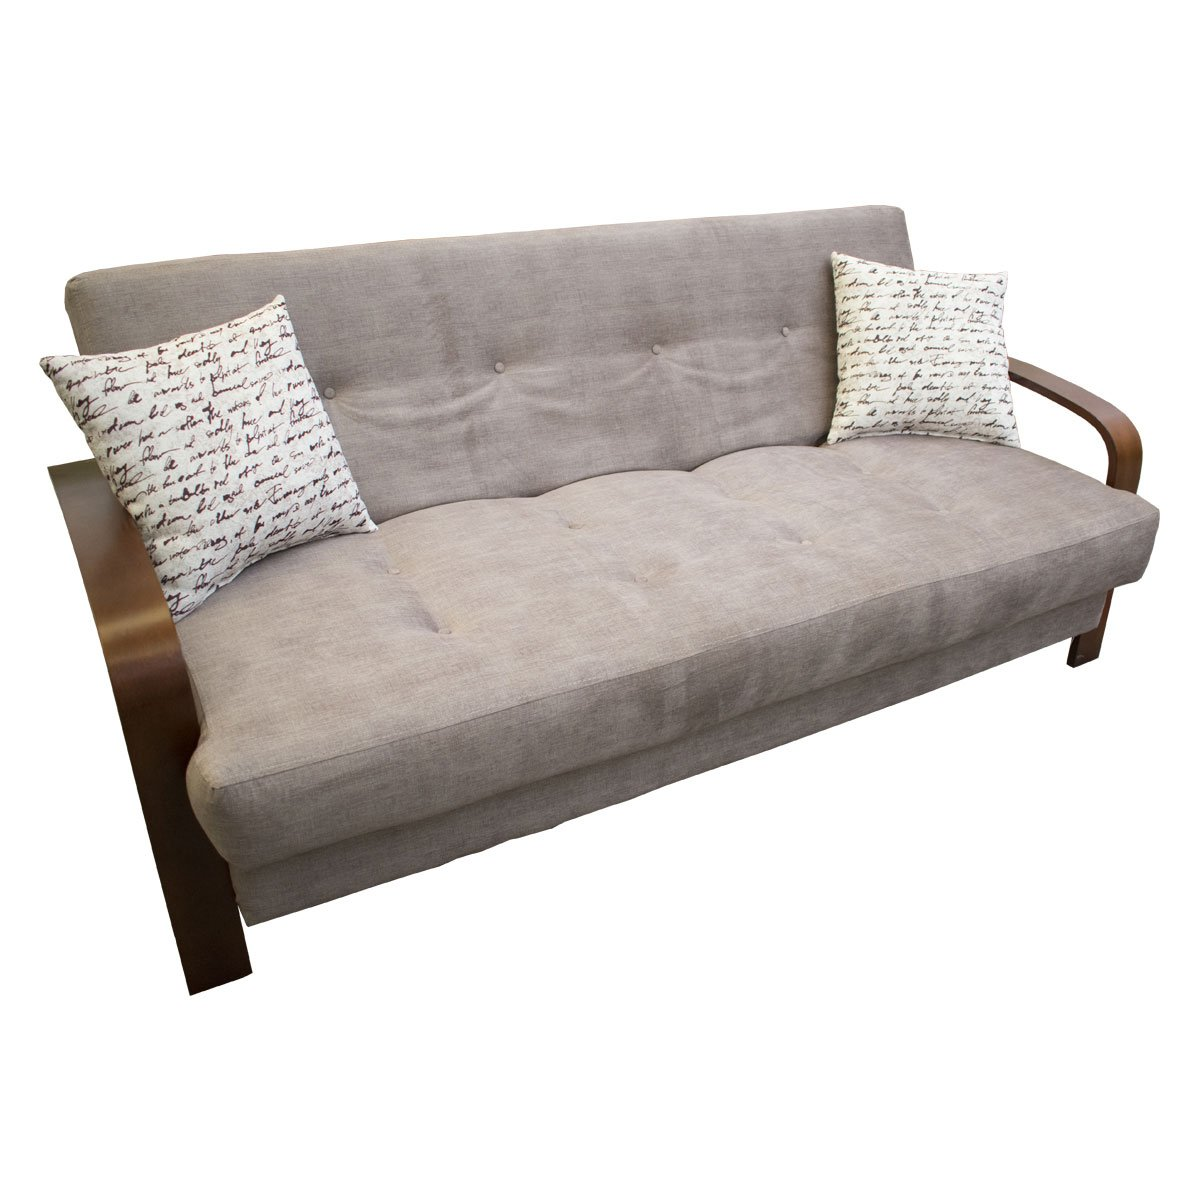 sofa cama individual mexico df beds austin tx sofá cerdeño violanti sears com mx me entiende